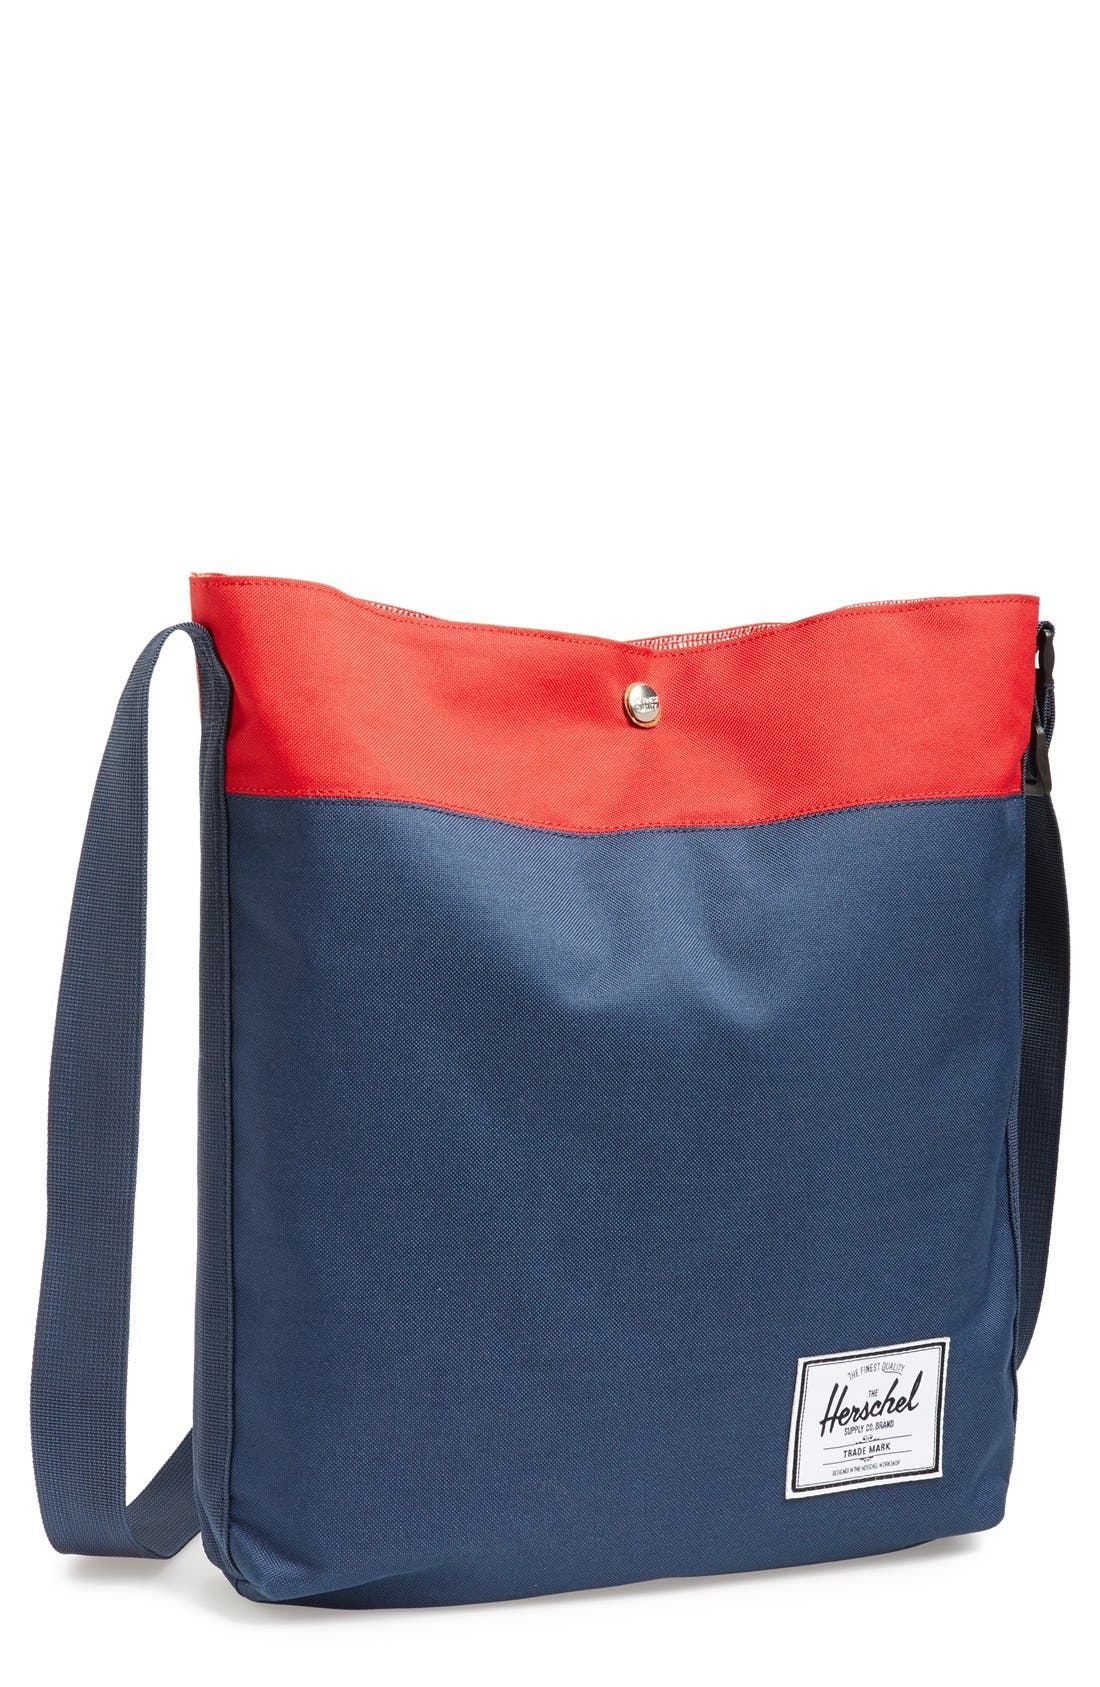 Main Image - Herschel Supply Co. 'Ottawa' Tote Bag